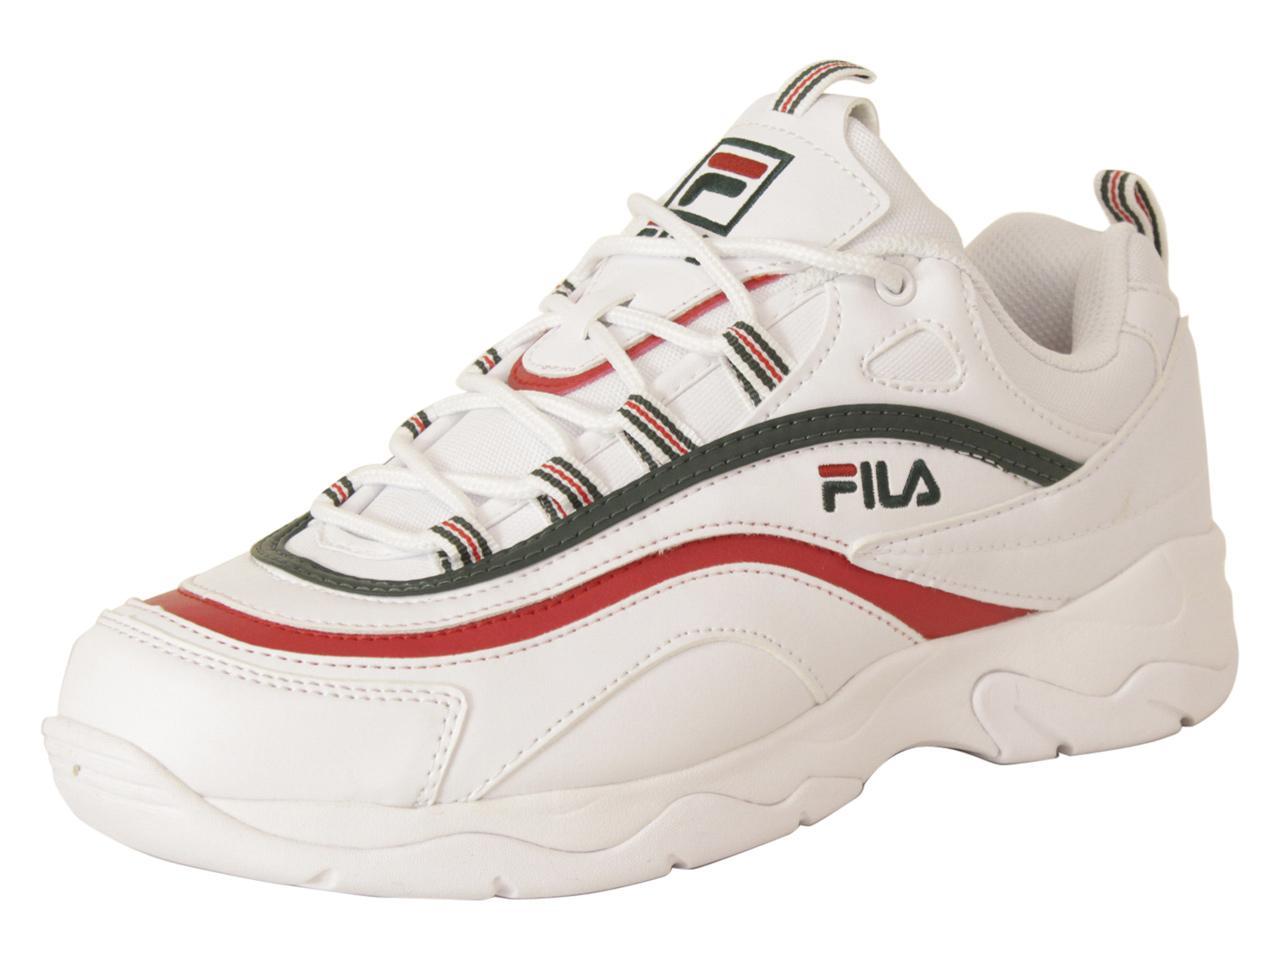 b57f5c29db Fila Men's Fila Ray Sneakers Shoes